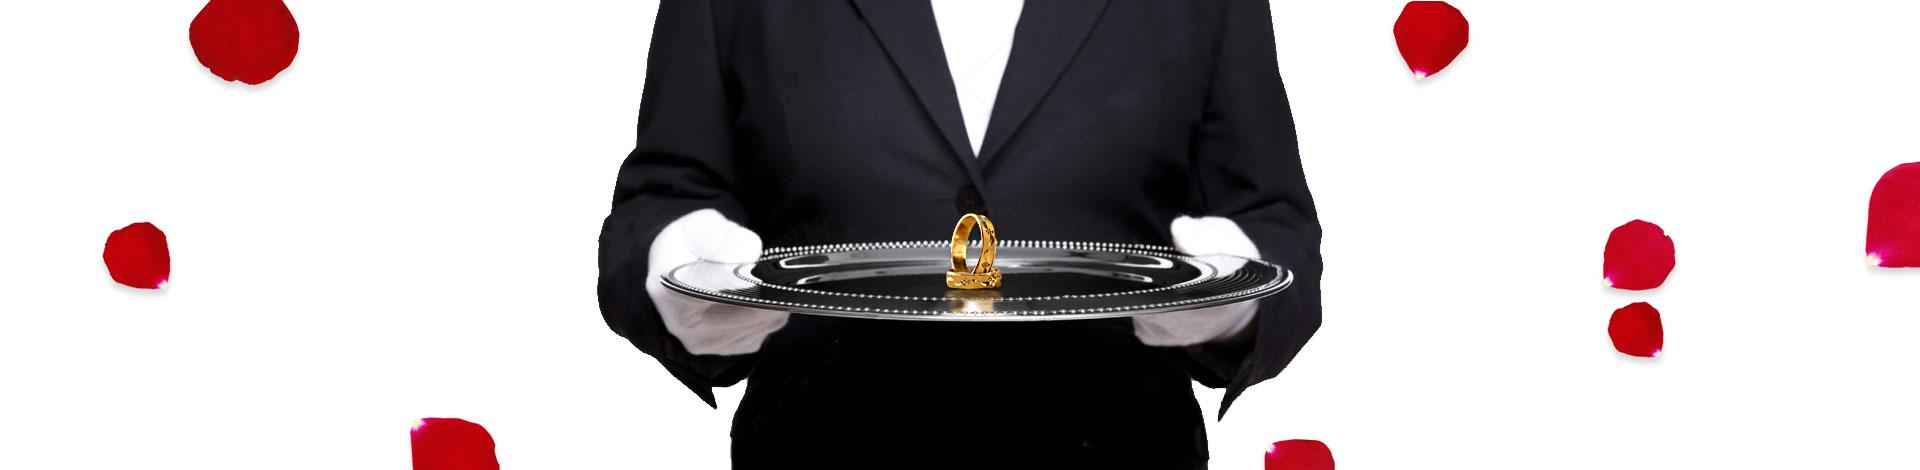 Luxury jewelry & diamonds   Free tailor made advise ✔ Zazare Diamonds